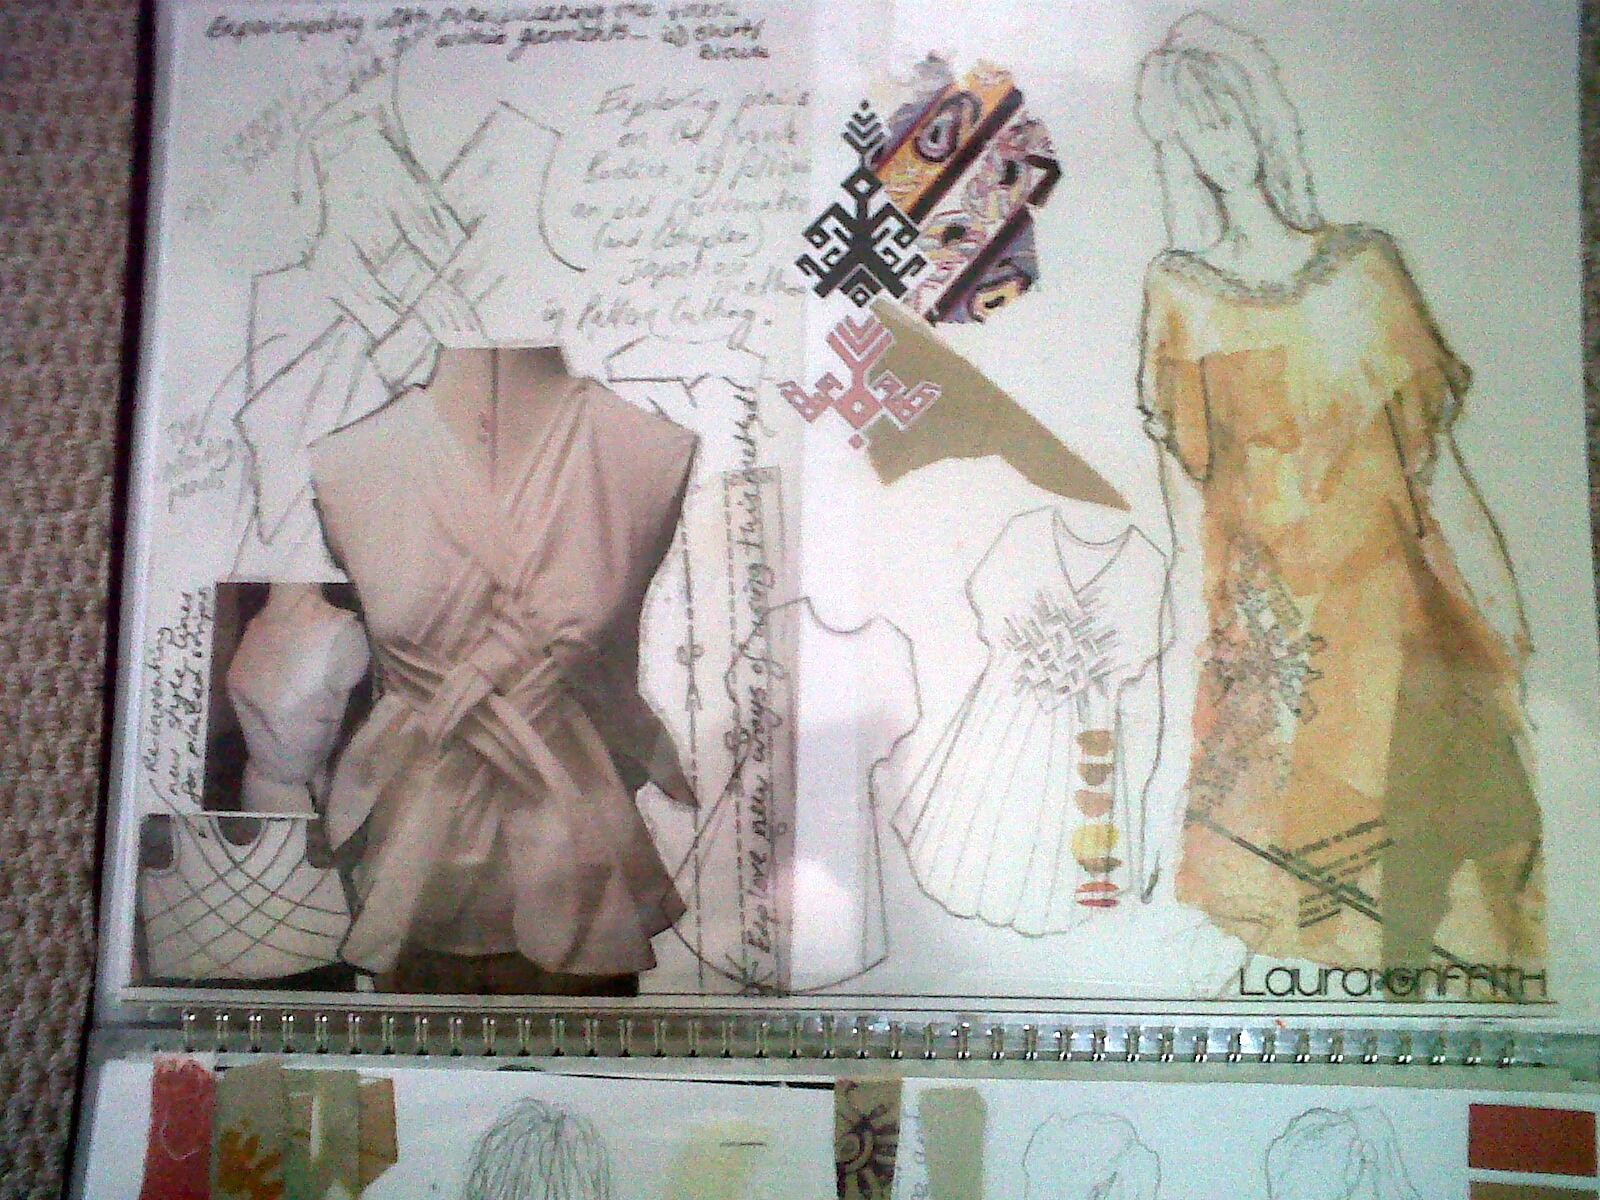 Euphoric Threads' Sketchbooks Design Inspiration